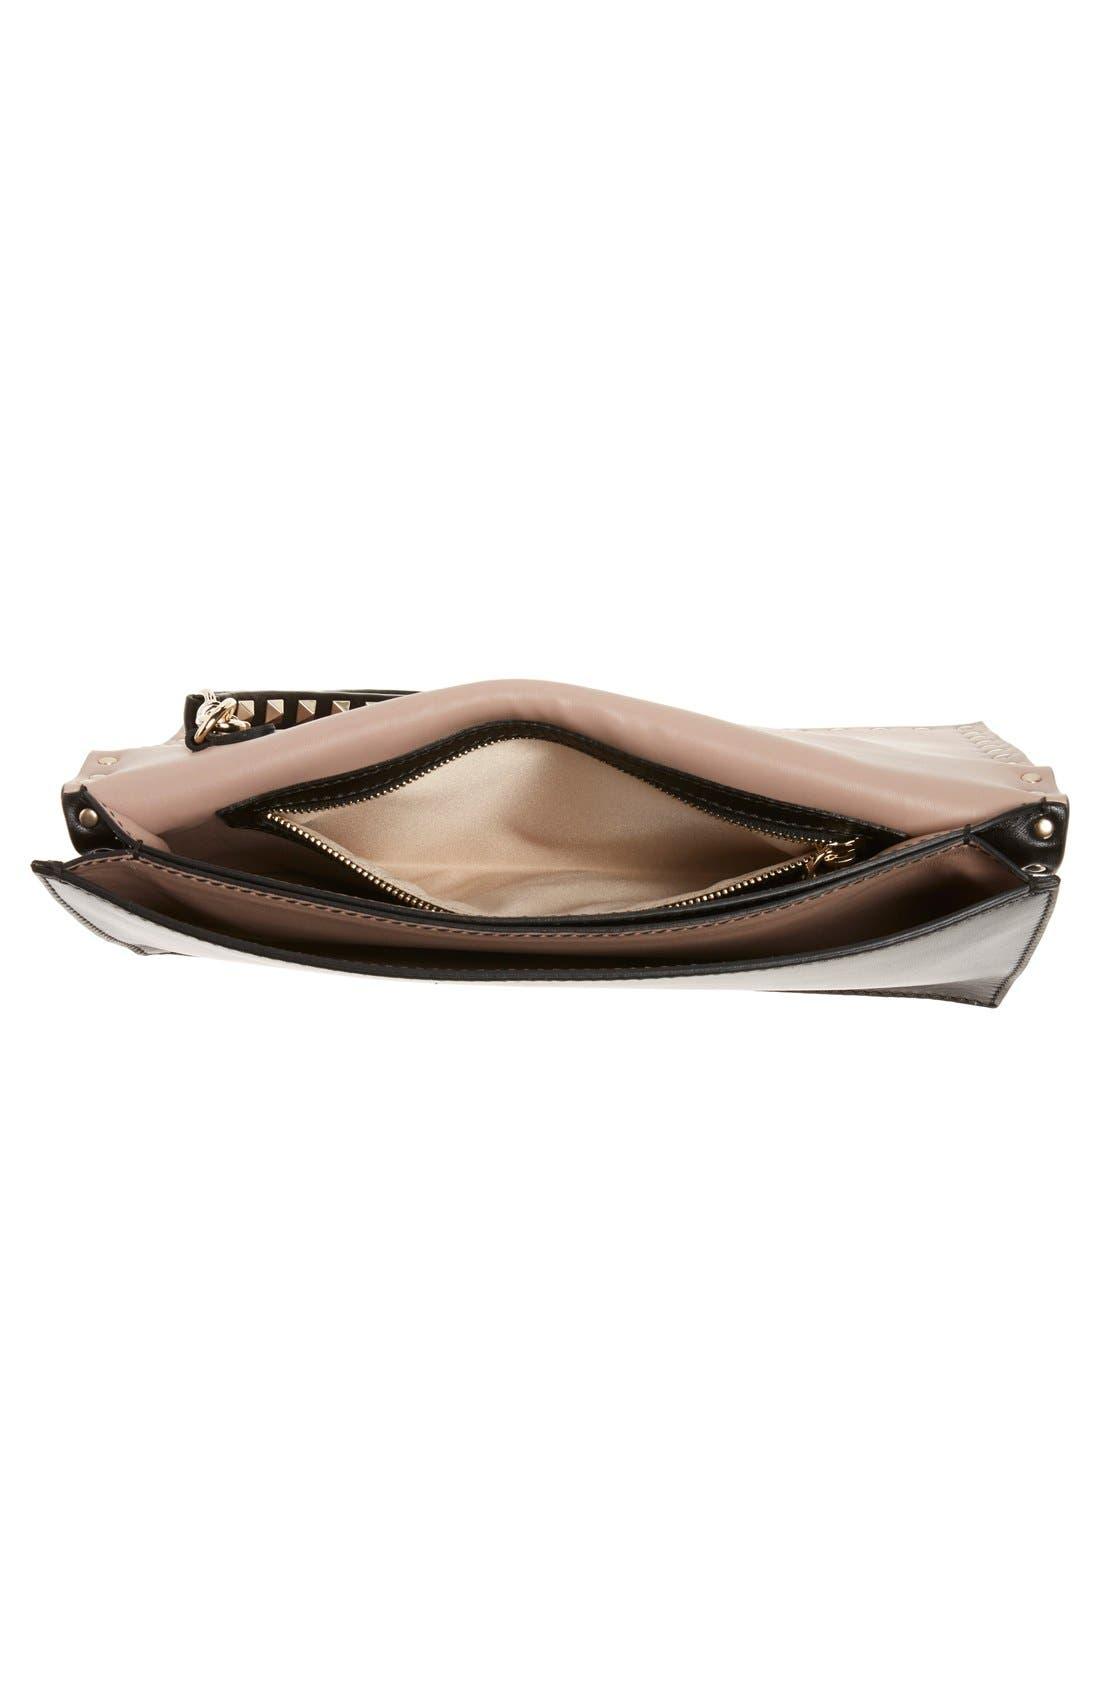 Alternate Image 4  - VALENTINO GARAVANI 'Rockstud' Leather Flap Clutch